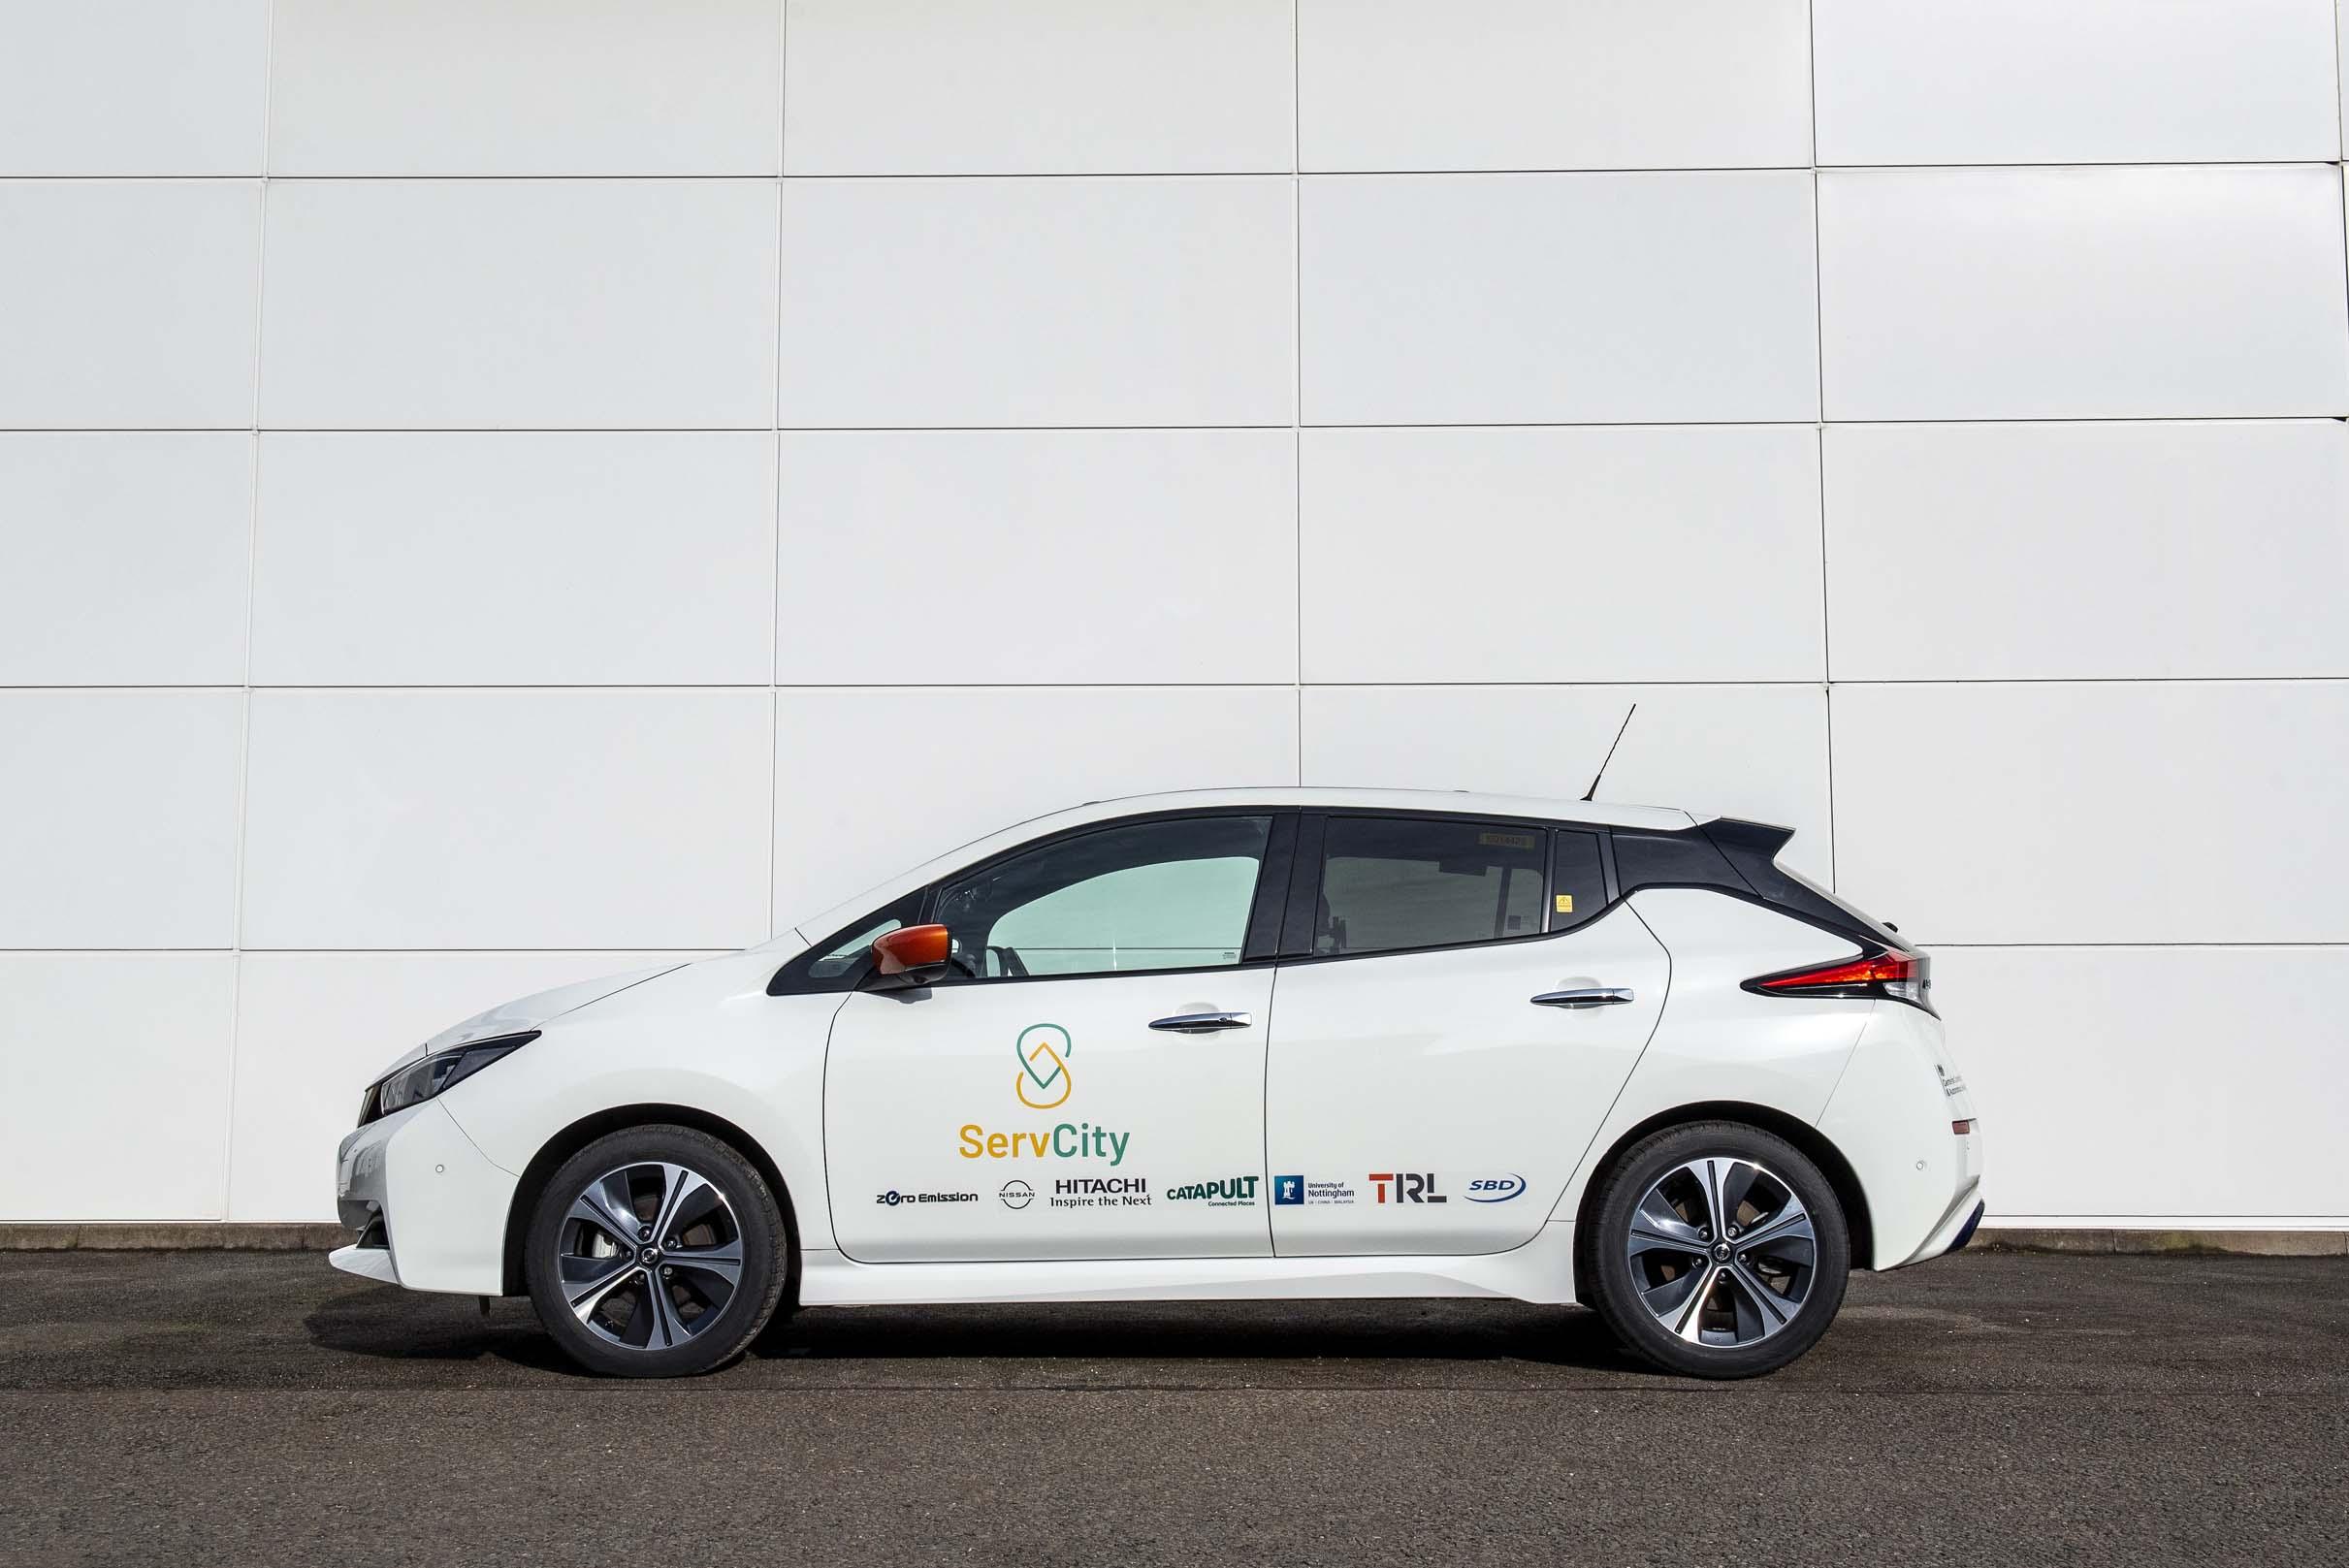 Nissan_SevCity_Leaf